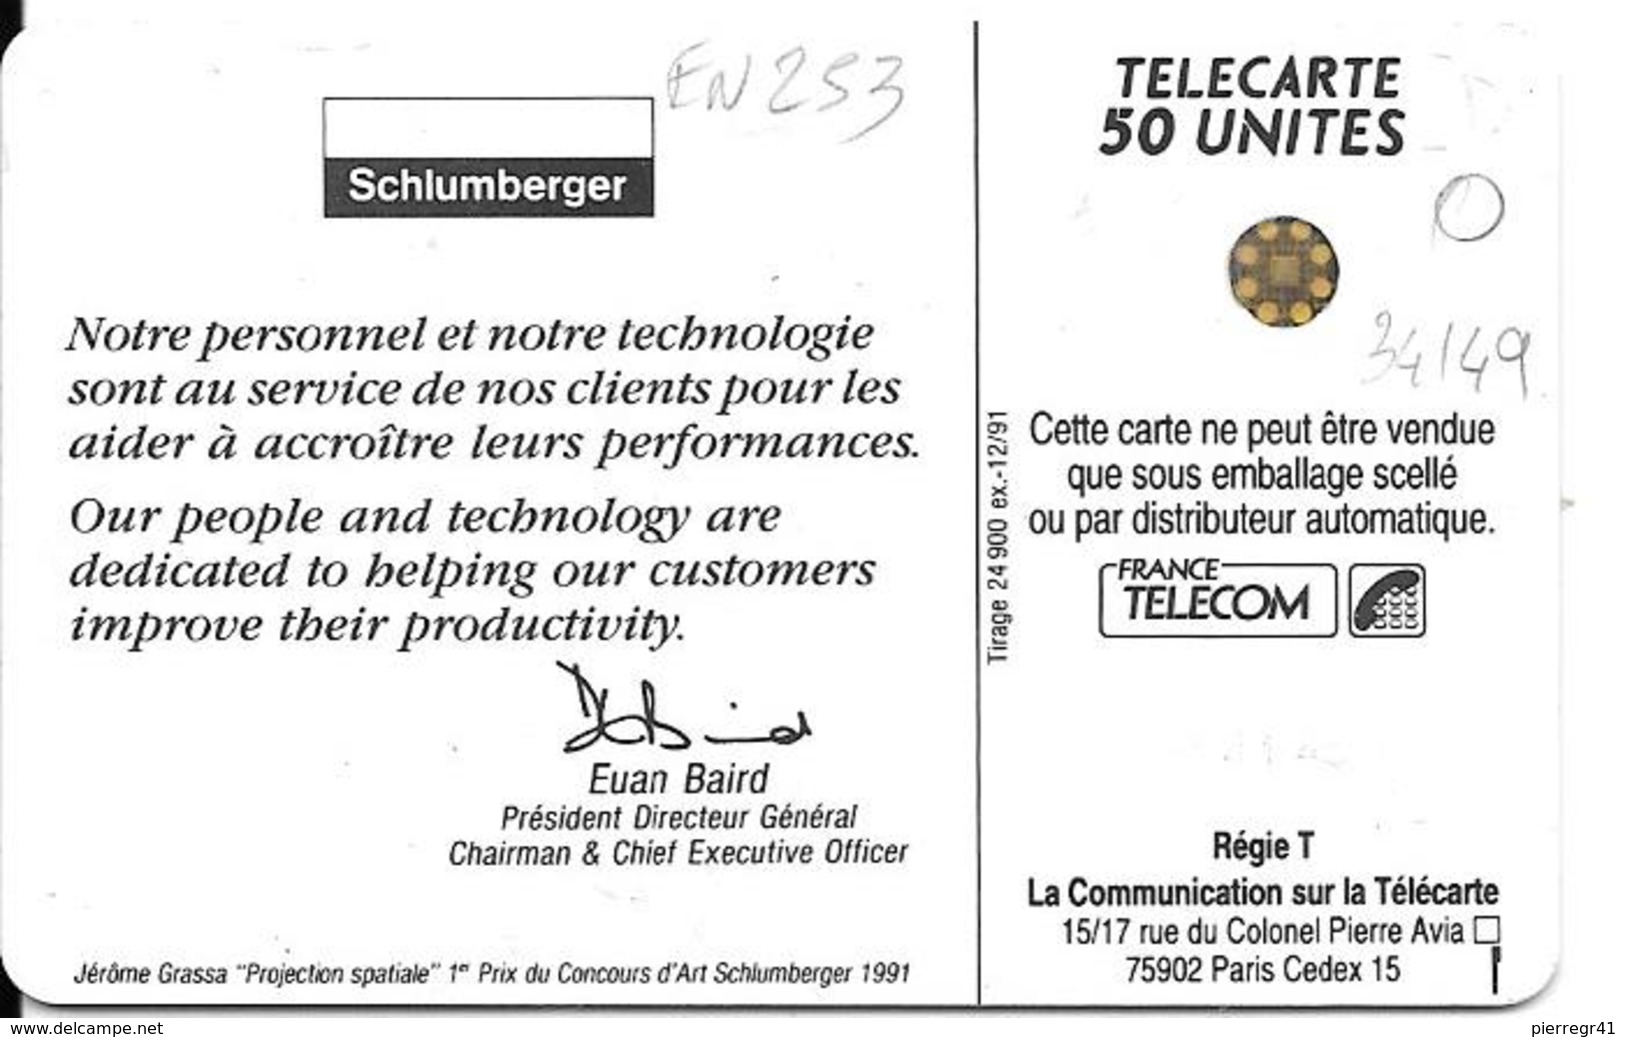 CARTE-PUCE-PRIVEE-PUBLIC-50U-EN 253-SC4an-N°5Ge 34149-12/91-SCHLUMBERGER-TABLEAU J GRASSA-UTILISE-TBE - France